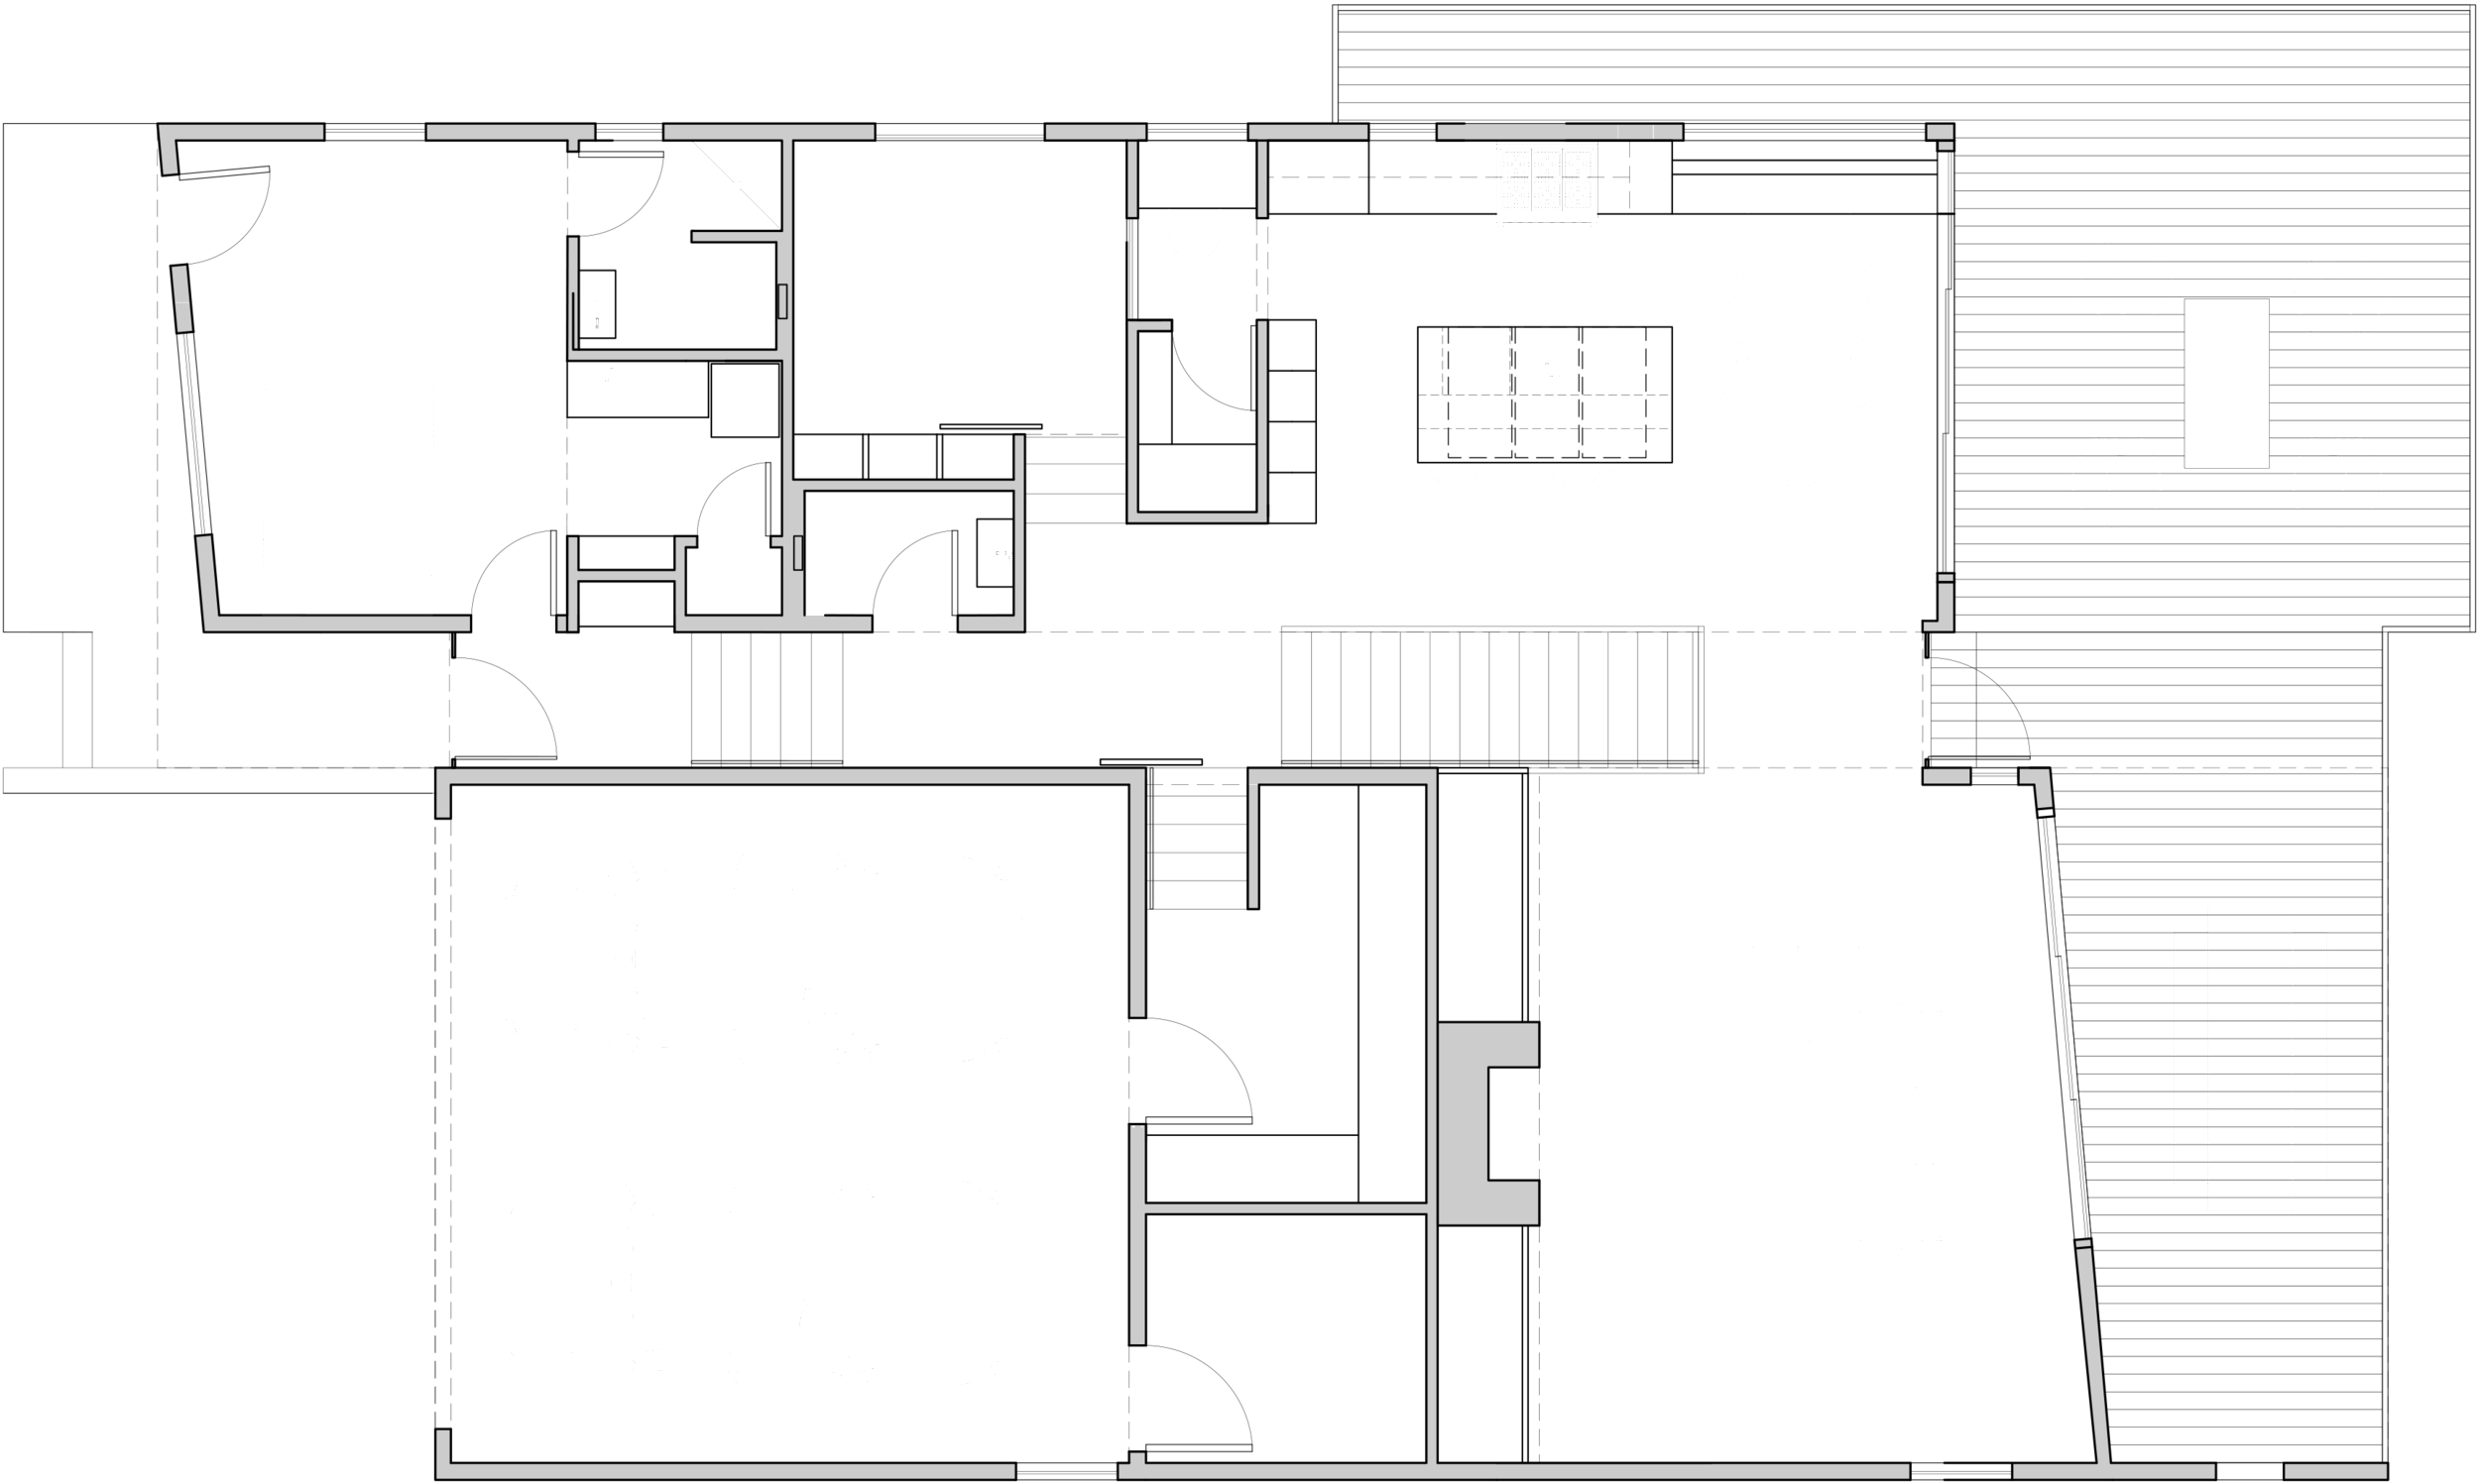 First Floor Plan_flat.png